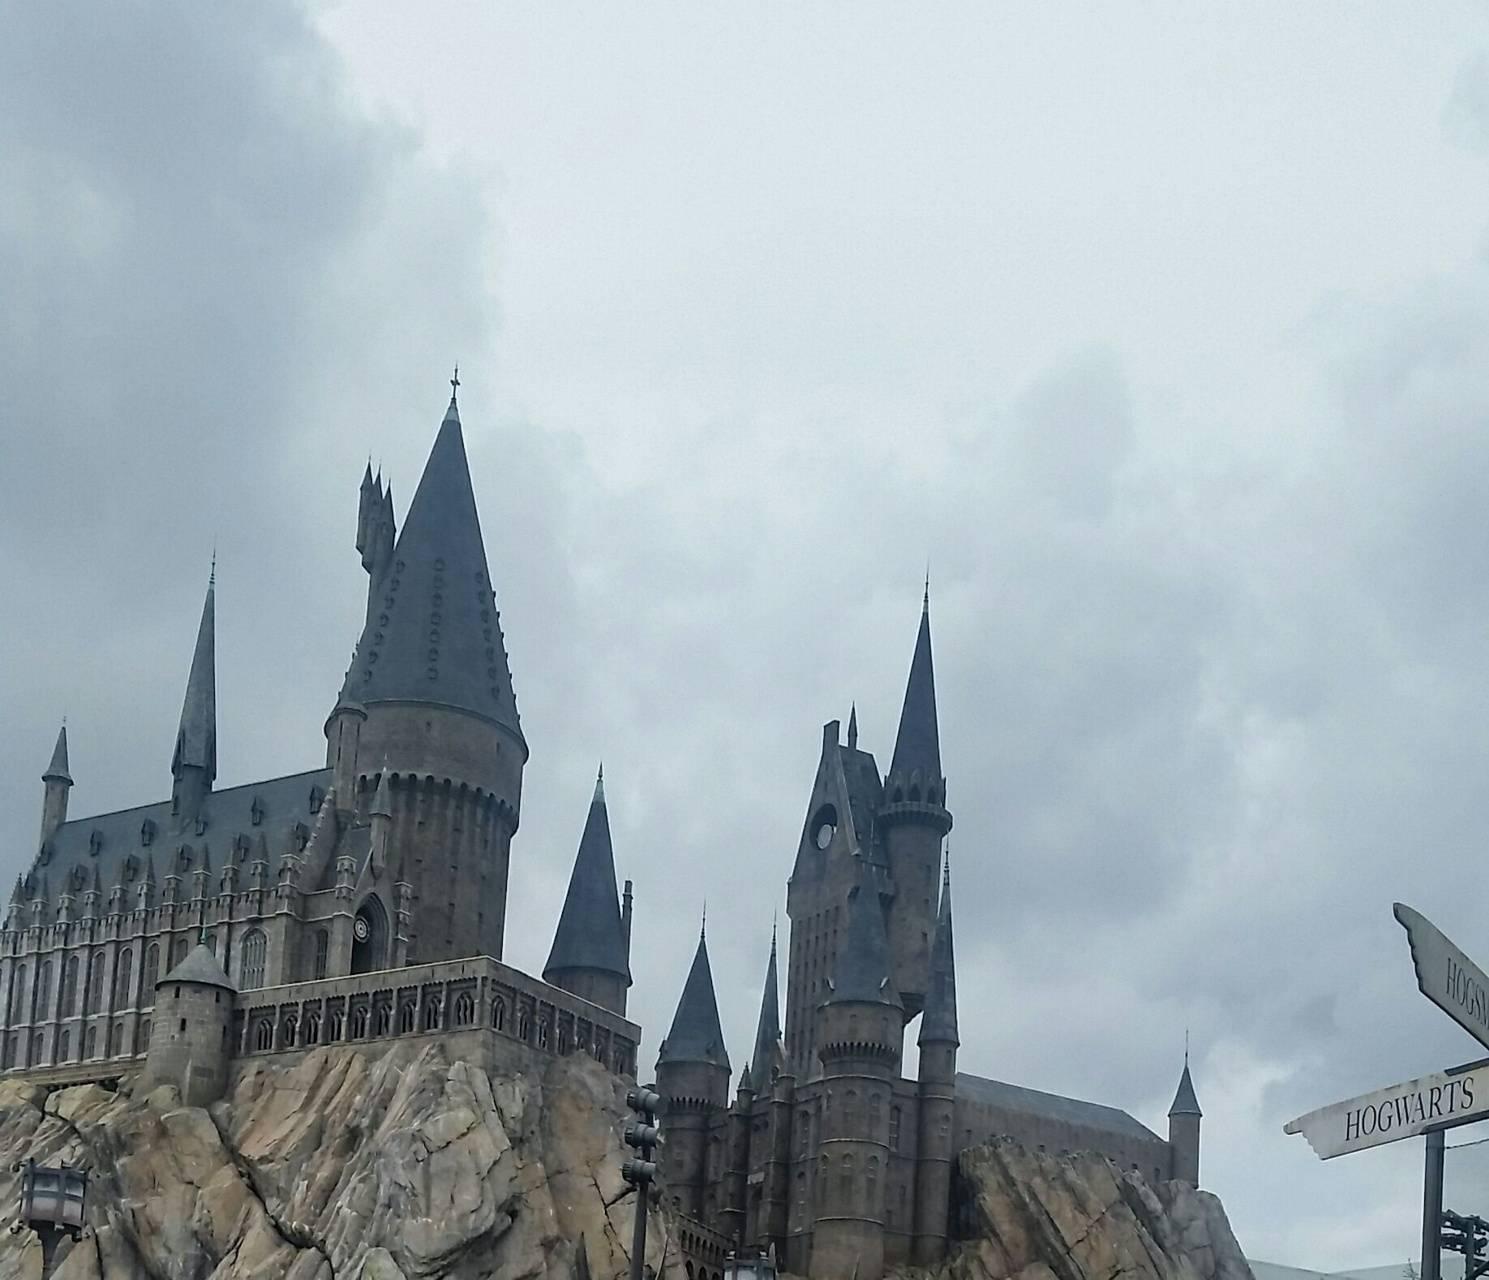 Hogwarts Wallpaper By Skyisthelimit1229 E9 Free On Zedge